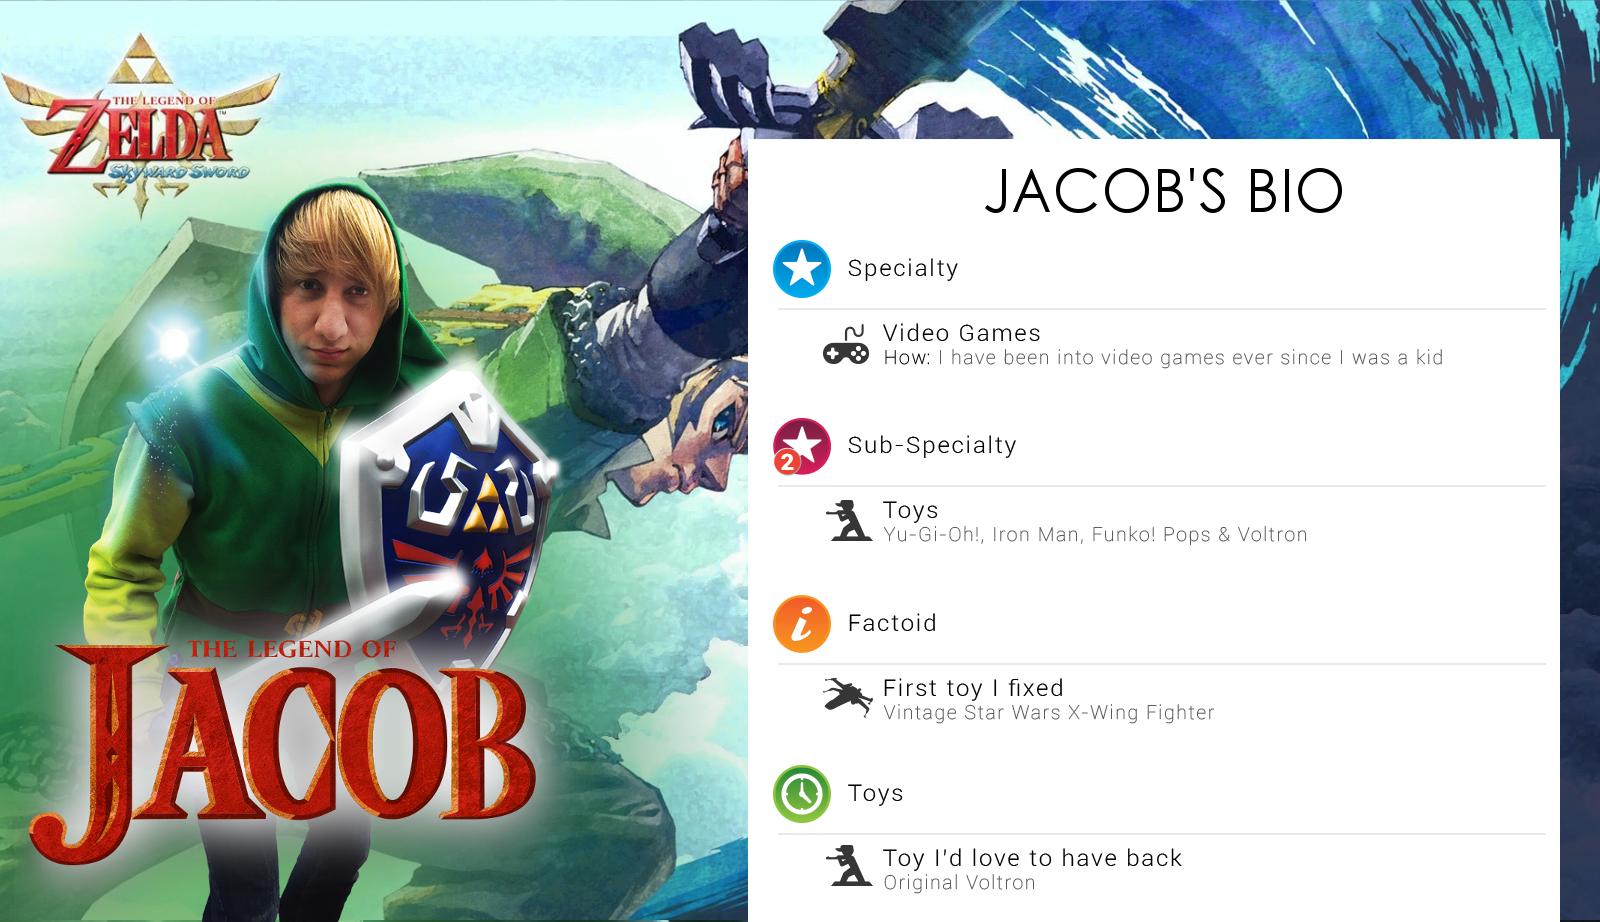 Jacob's bio